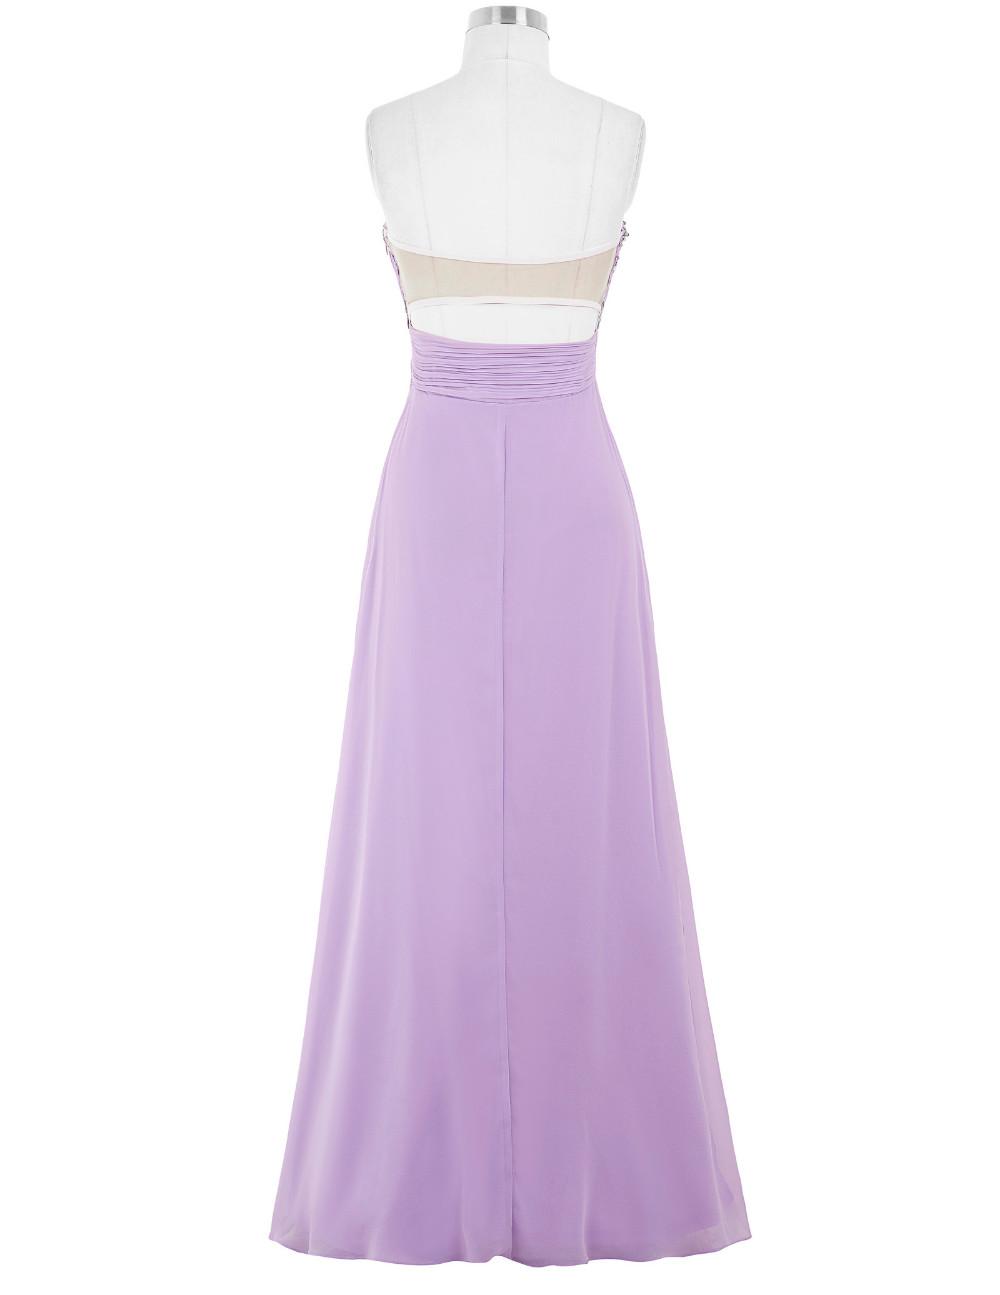 Lavender Green Blue Bridesmaid Dresses Long Wedding Party Dress Bruidsmeisjes Jurk Chiffon Gelinlik Prom Dresses for Bridesmaids 7